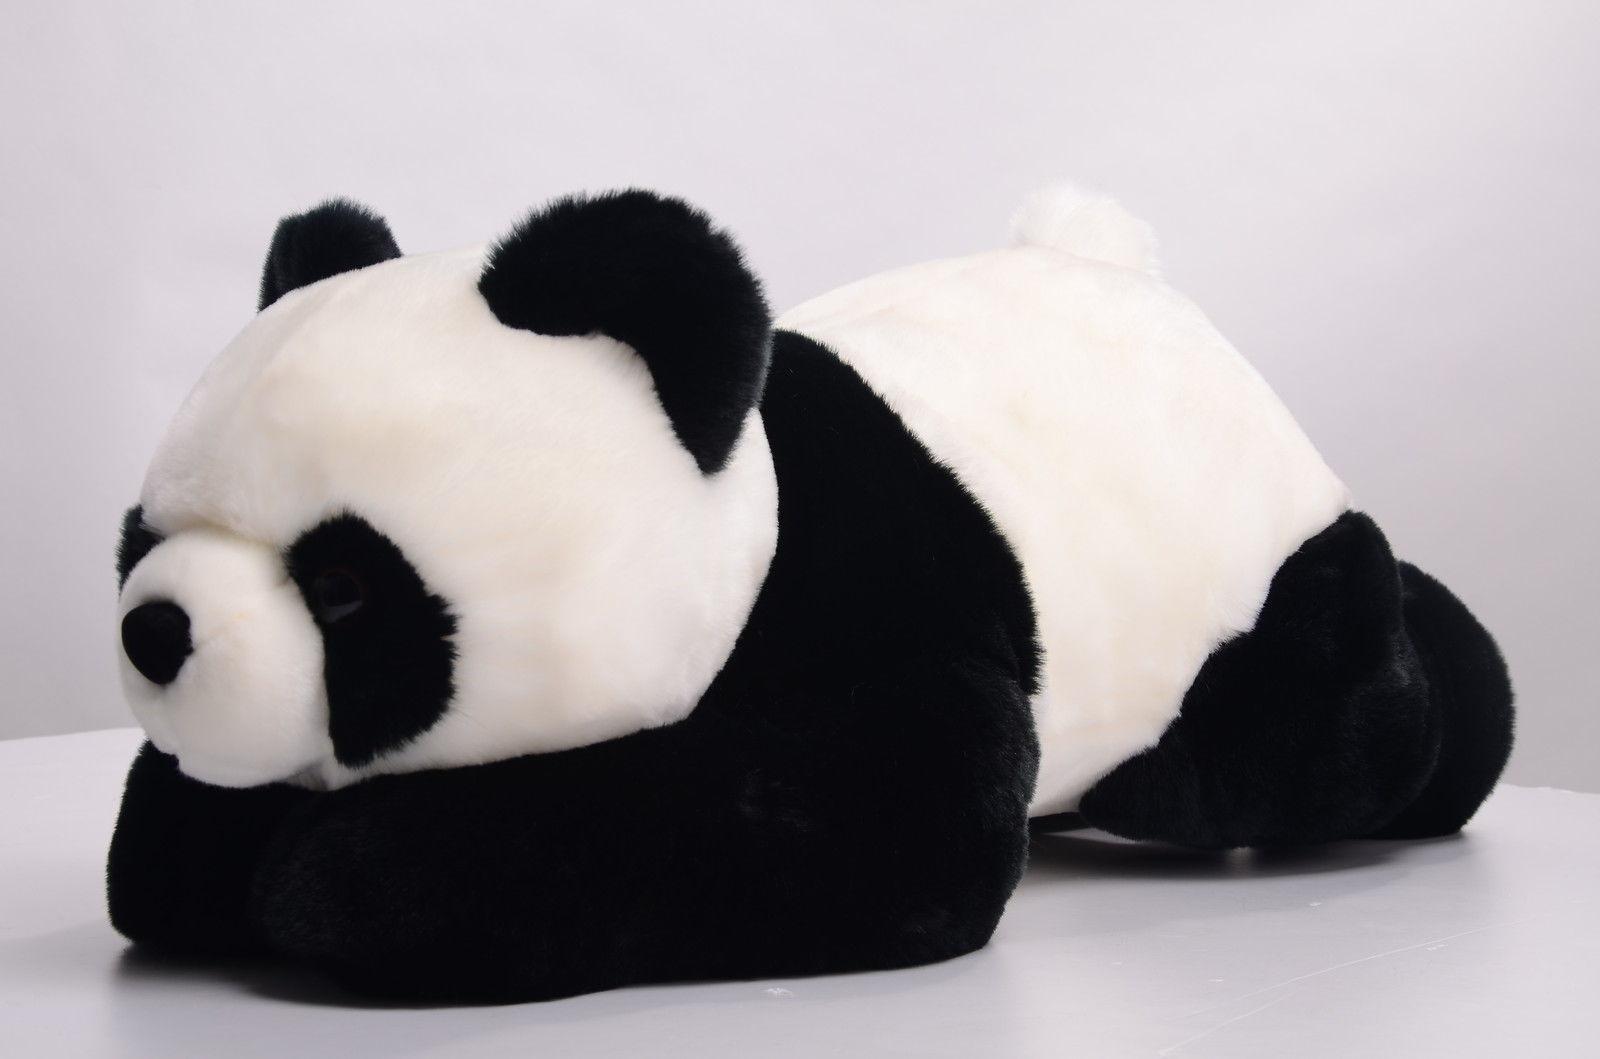 58cm Sprawled Panda Toys Stuffed Animal Plush Cute Branded Animal Soft Kid Doll Gifts